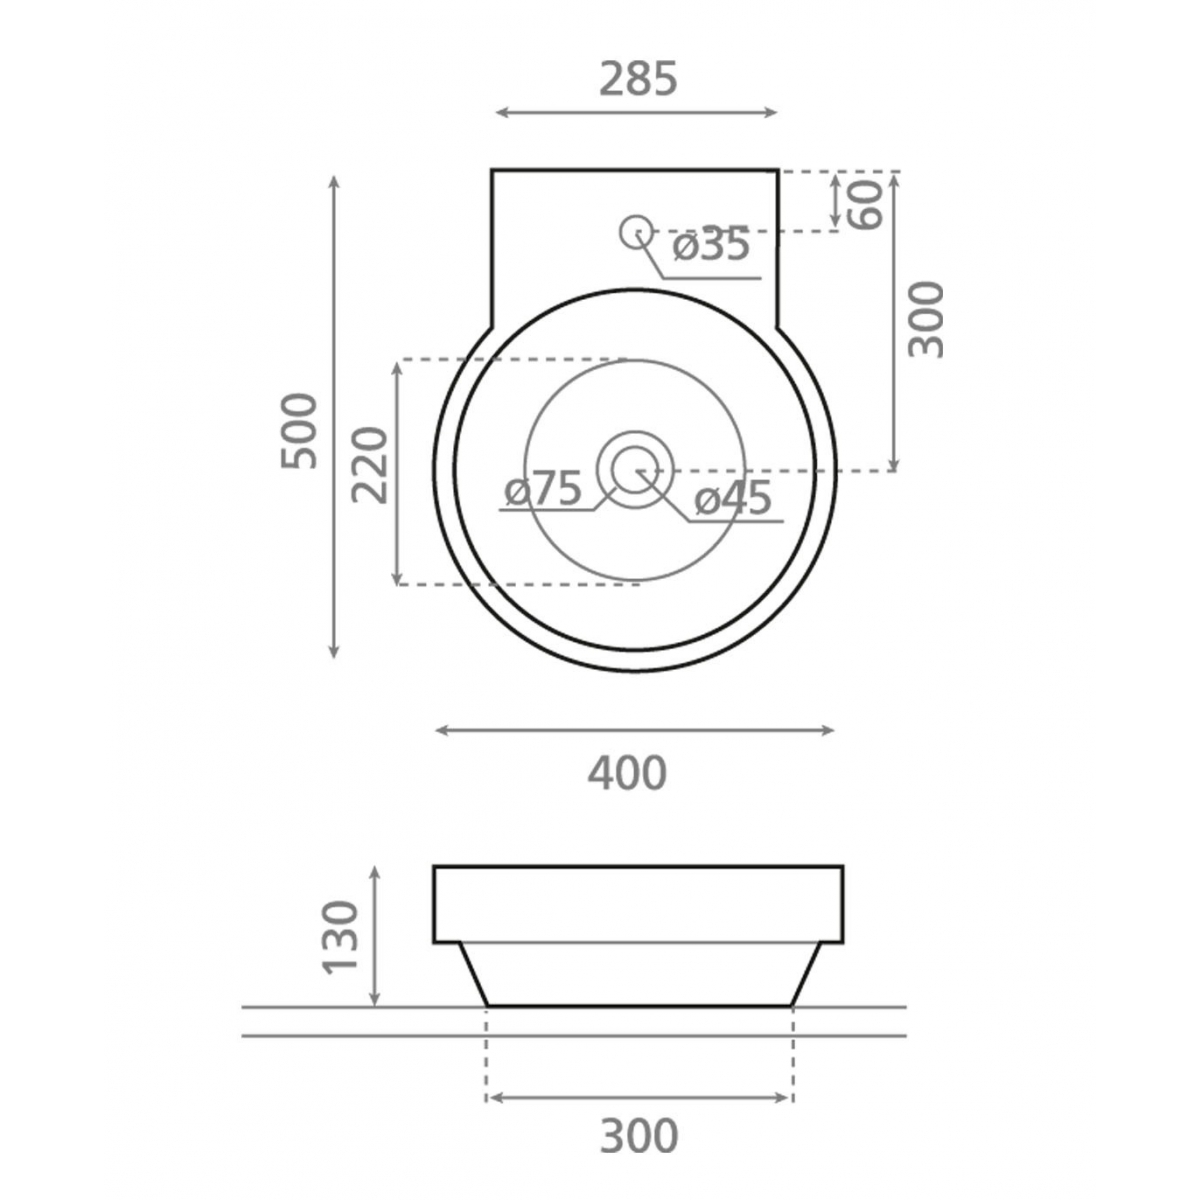 Lavabo Circular Roma - Lavabos circulares - Marca The Bathco